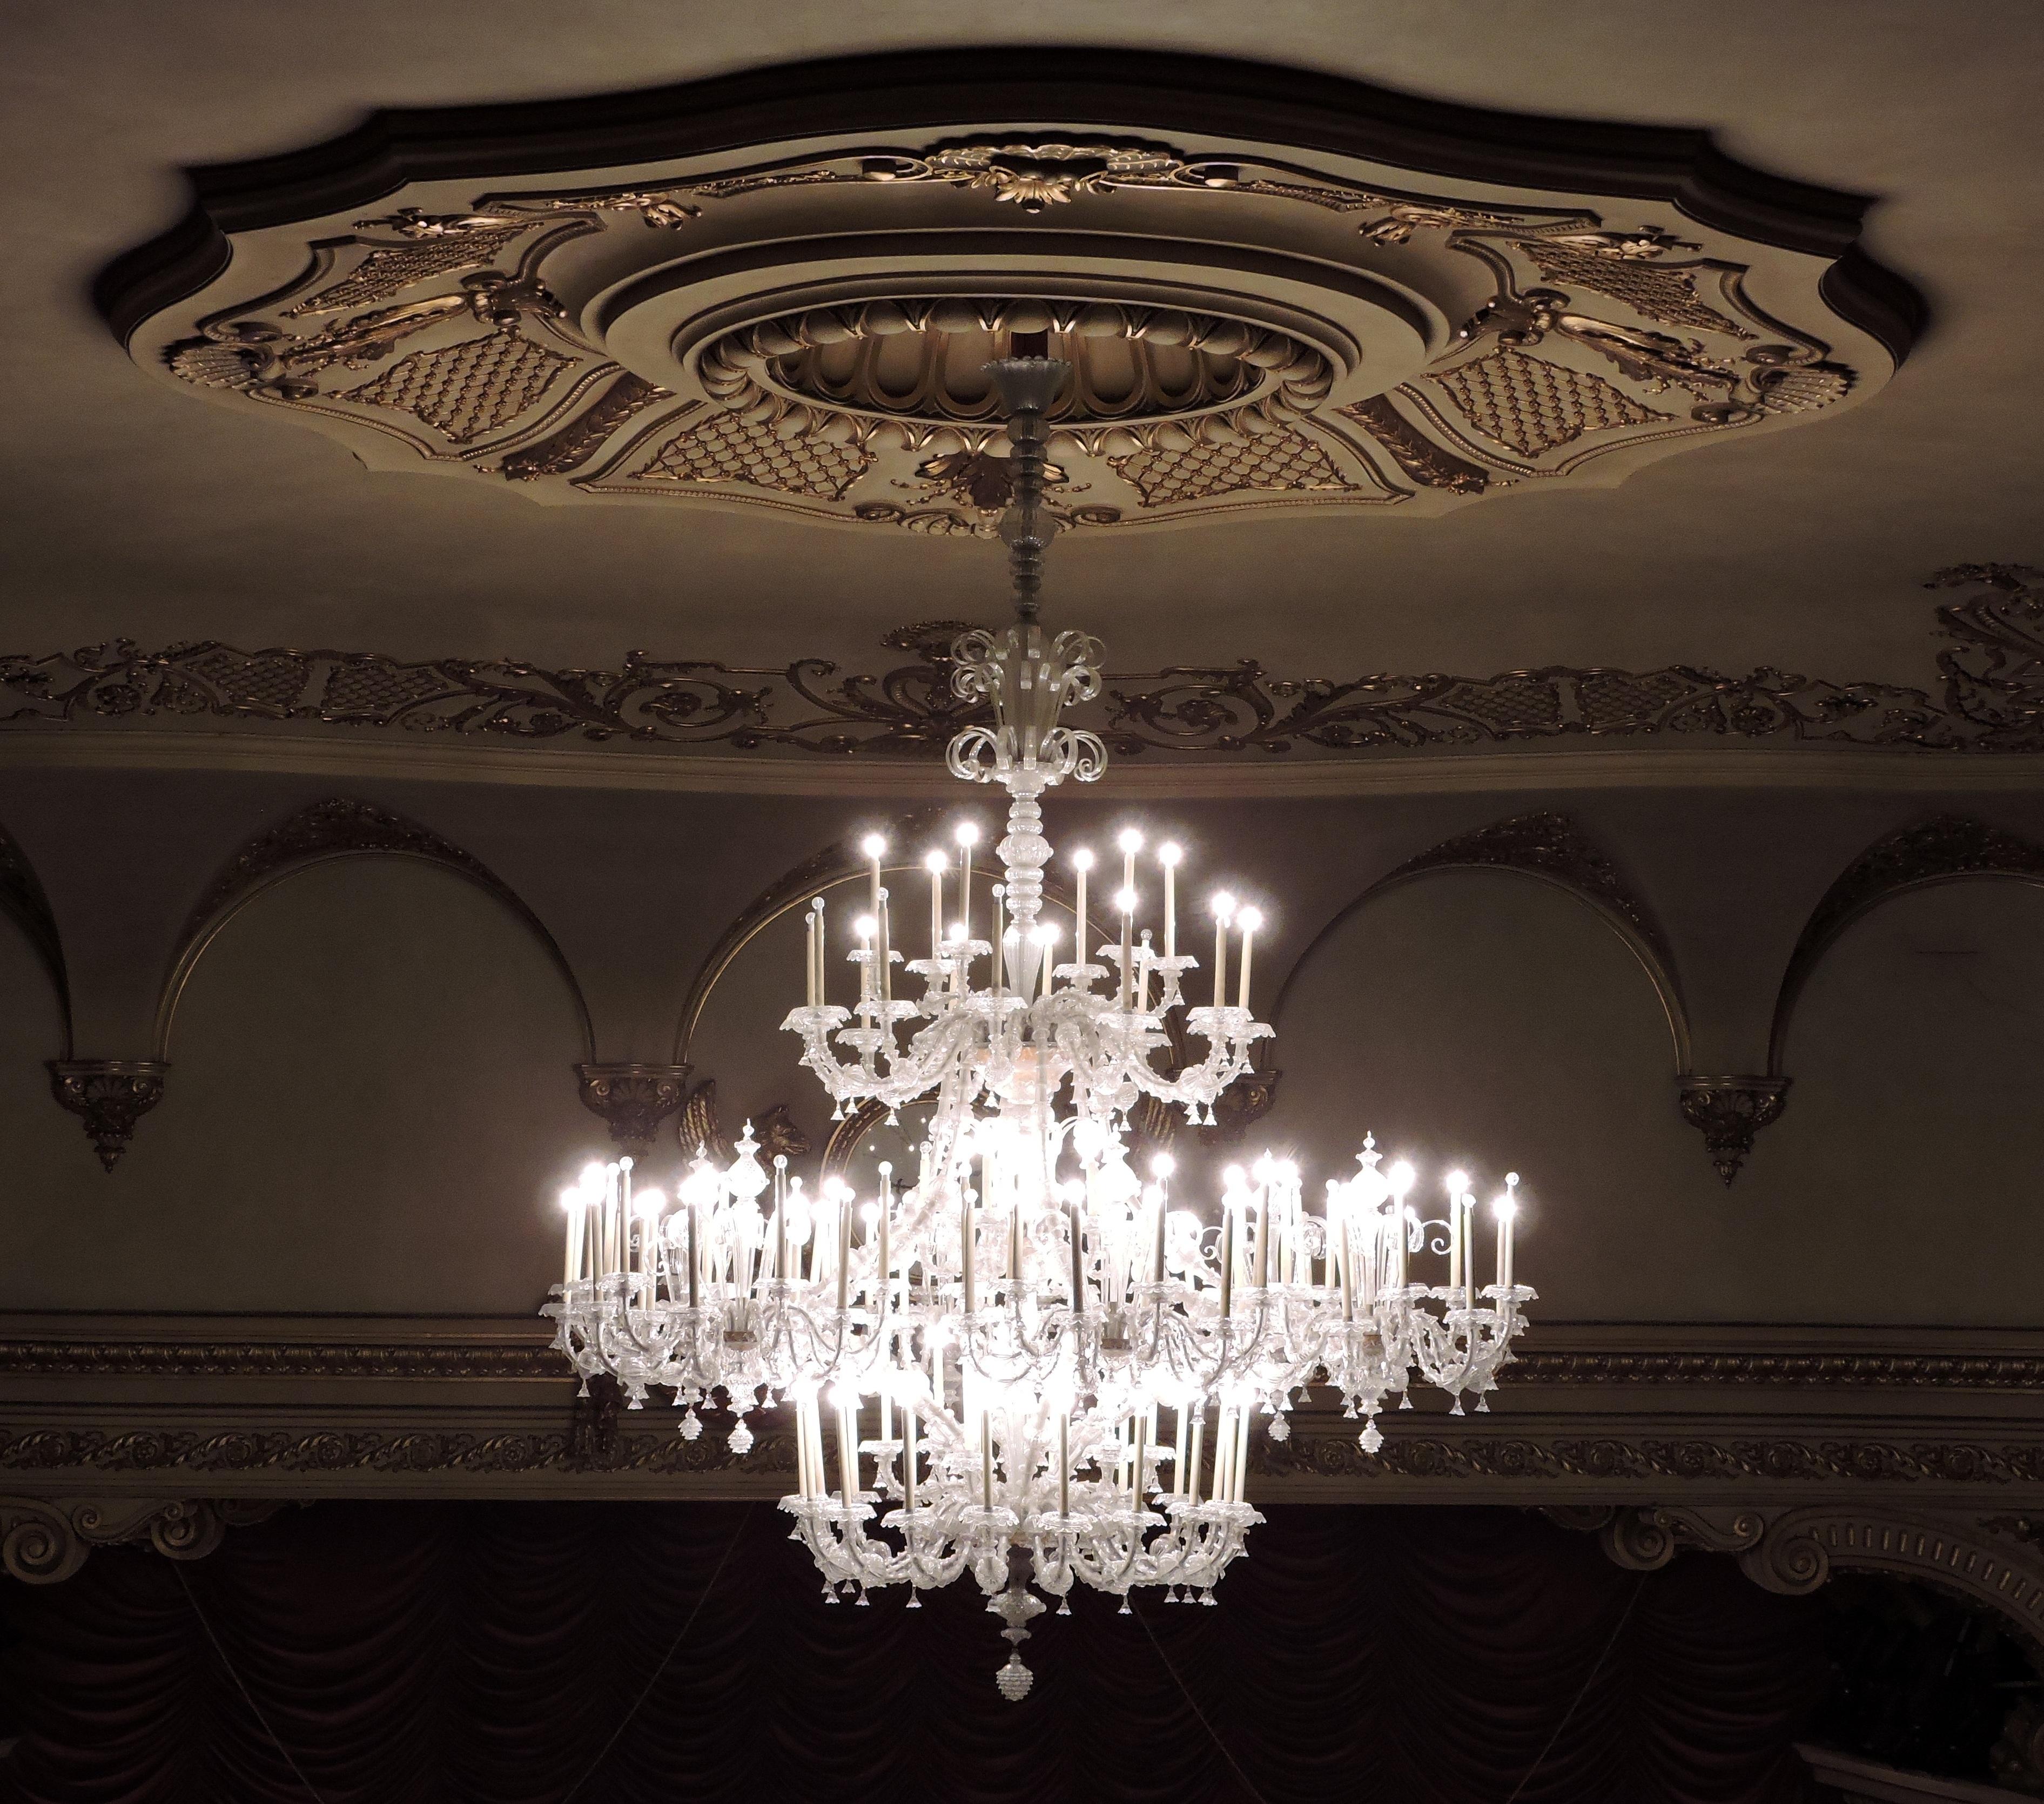 light ceiling lighting decor symmetry light fixture verona teatro chandelier lit light bulbs filarmonico - Lit Original